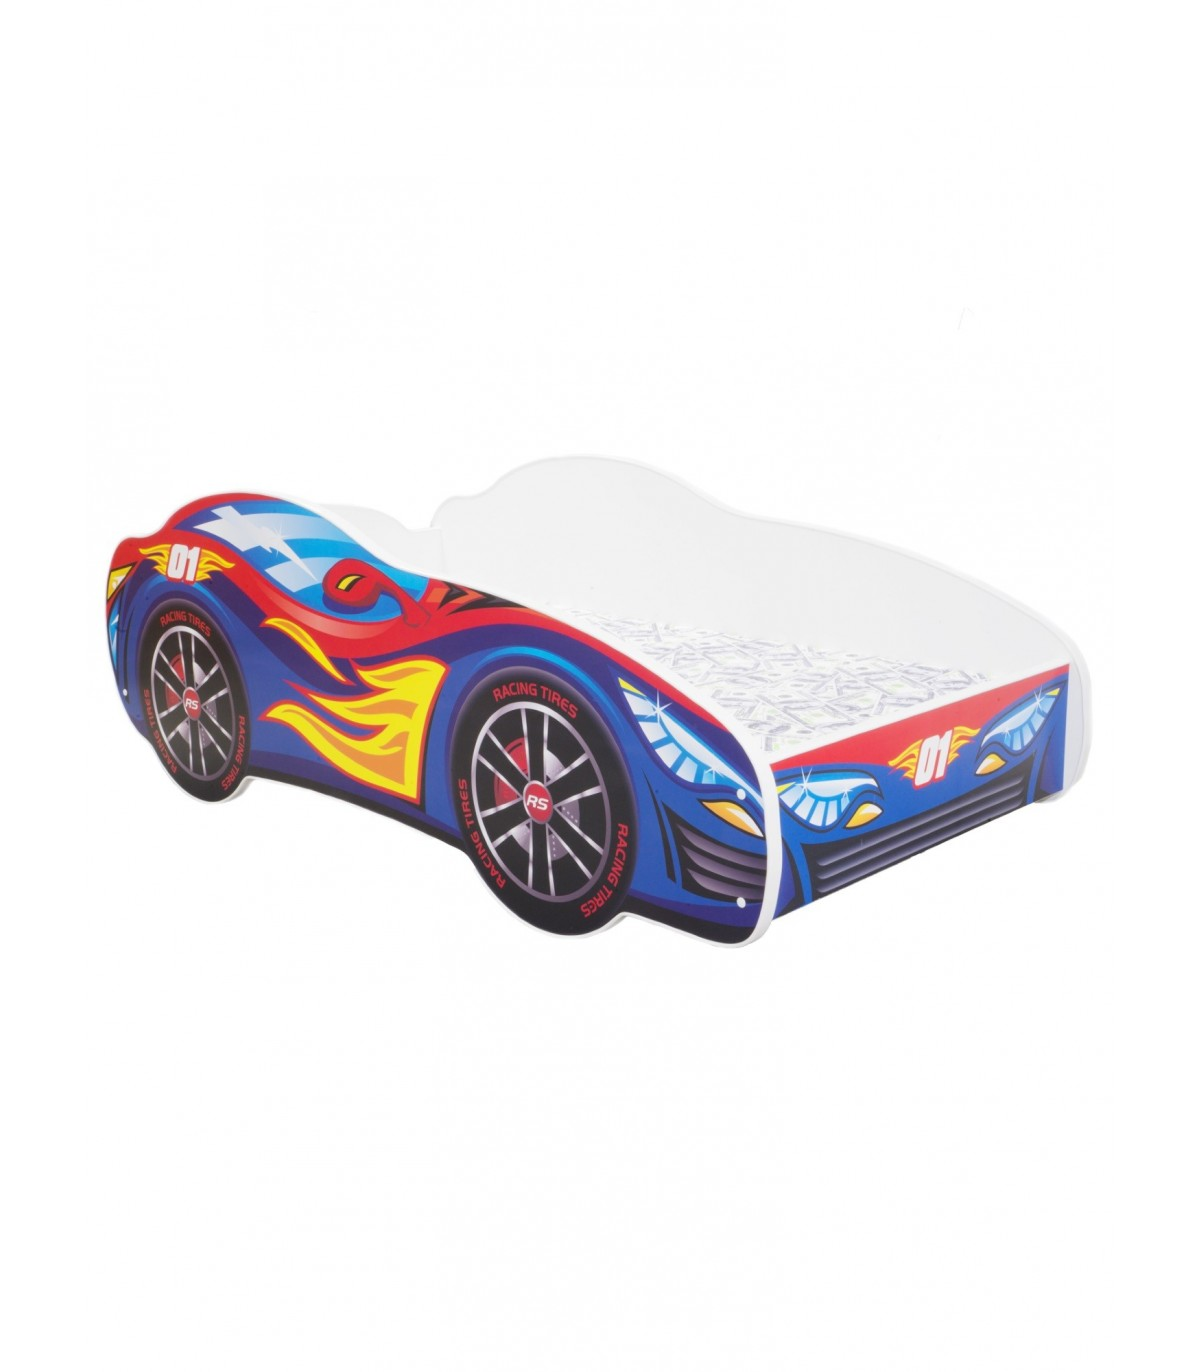 Racing Car Bed Toddler Red Blue Mattress Pillow